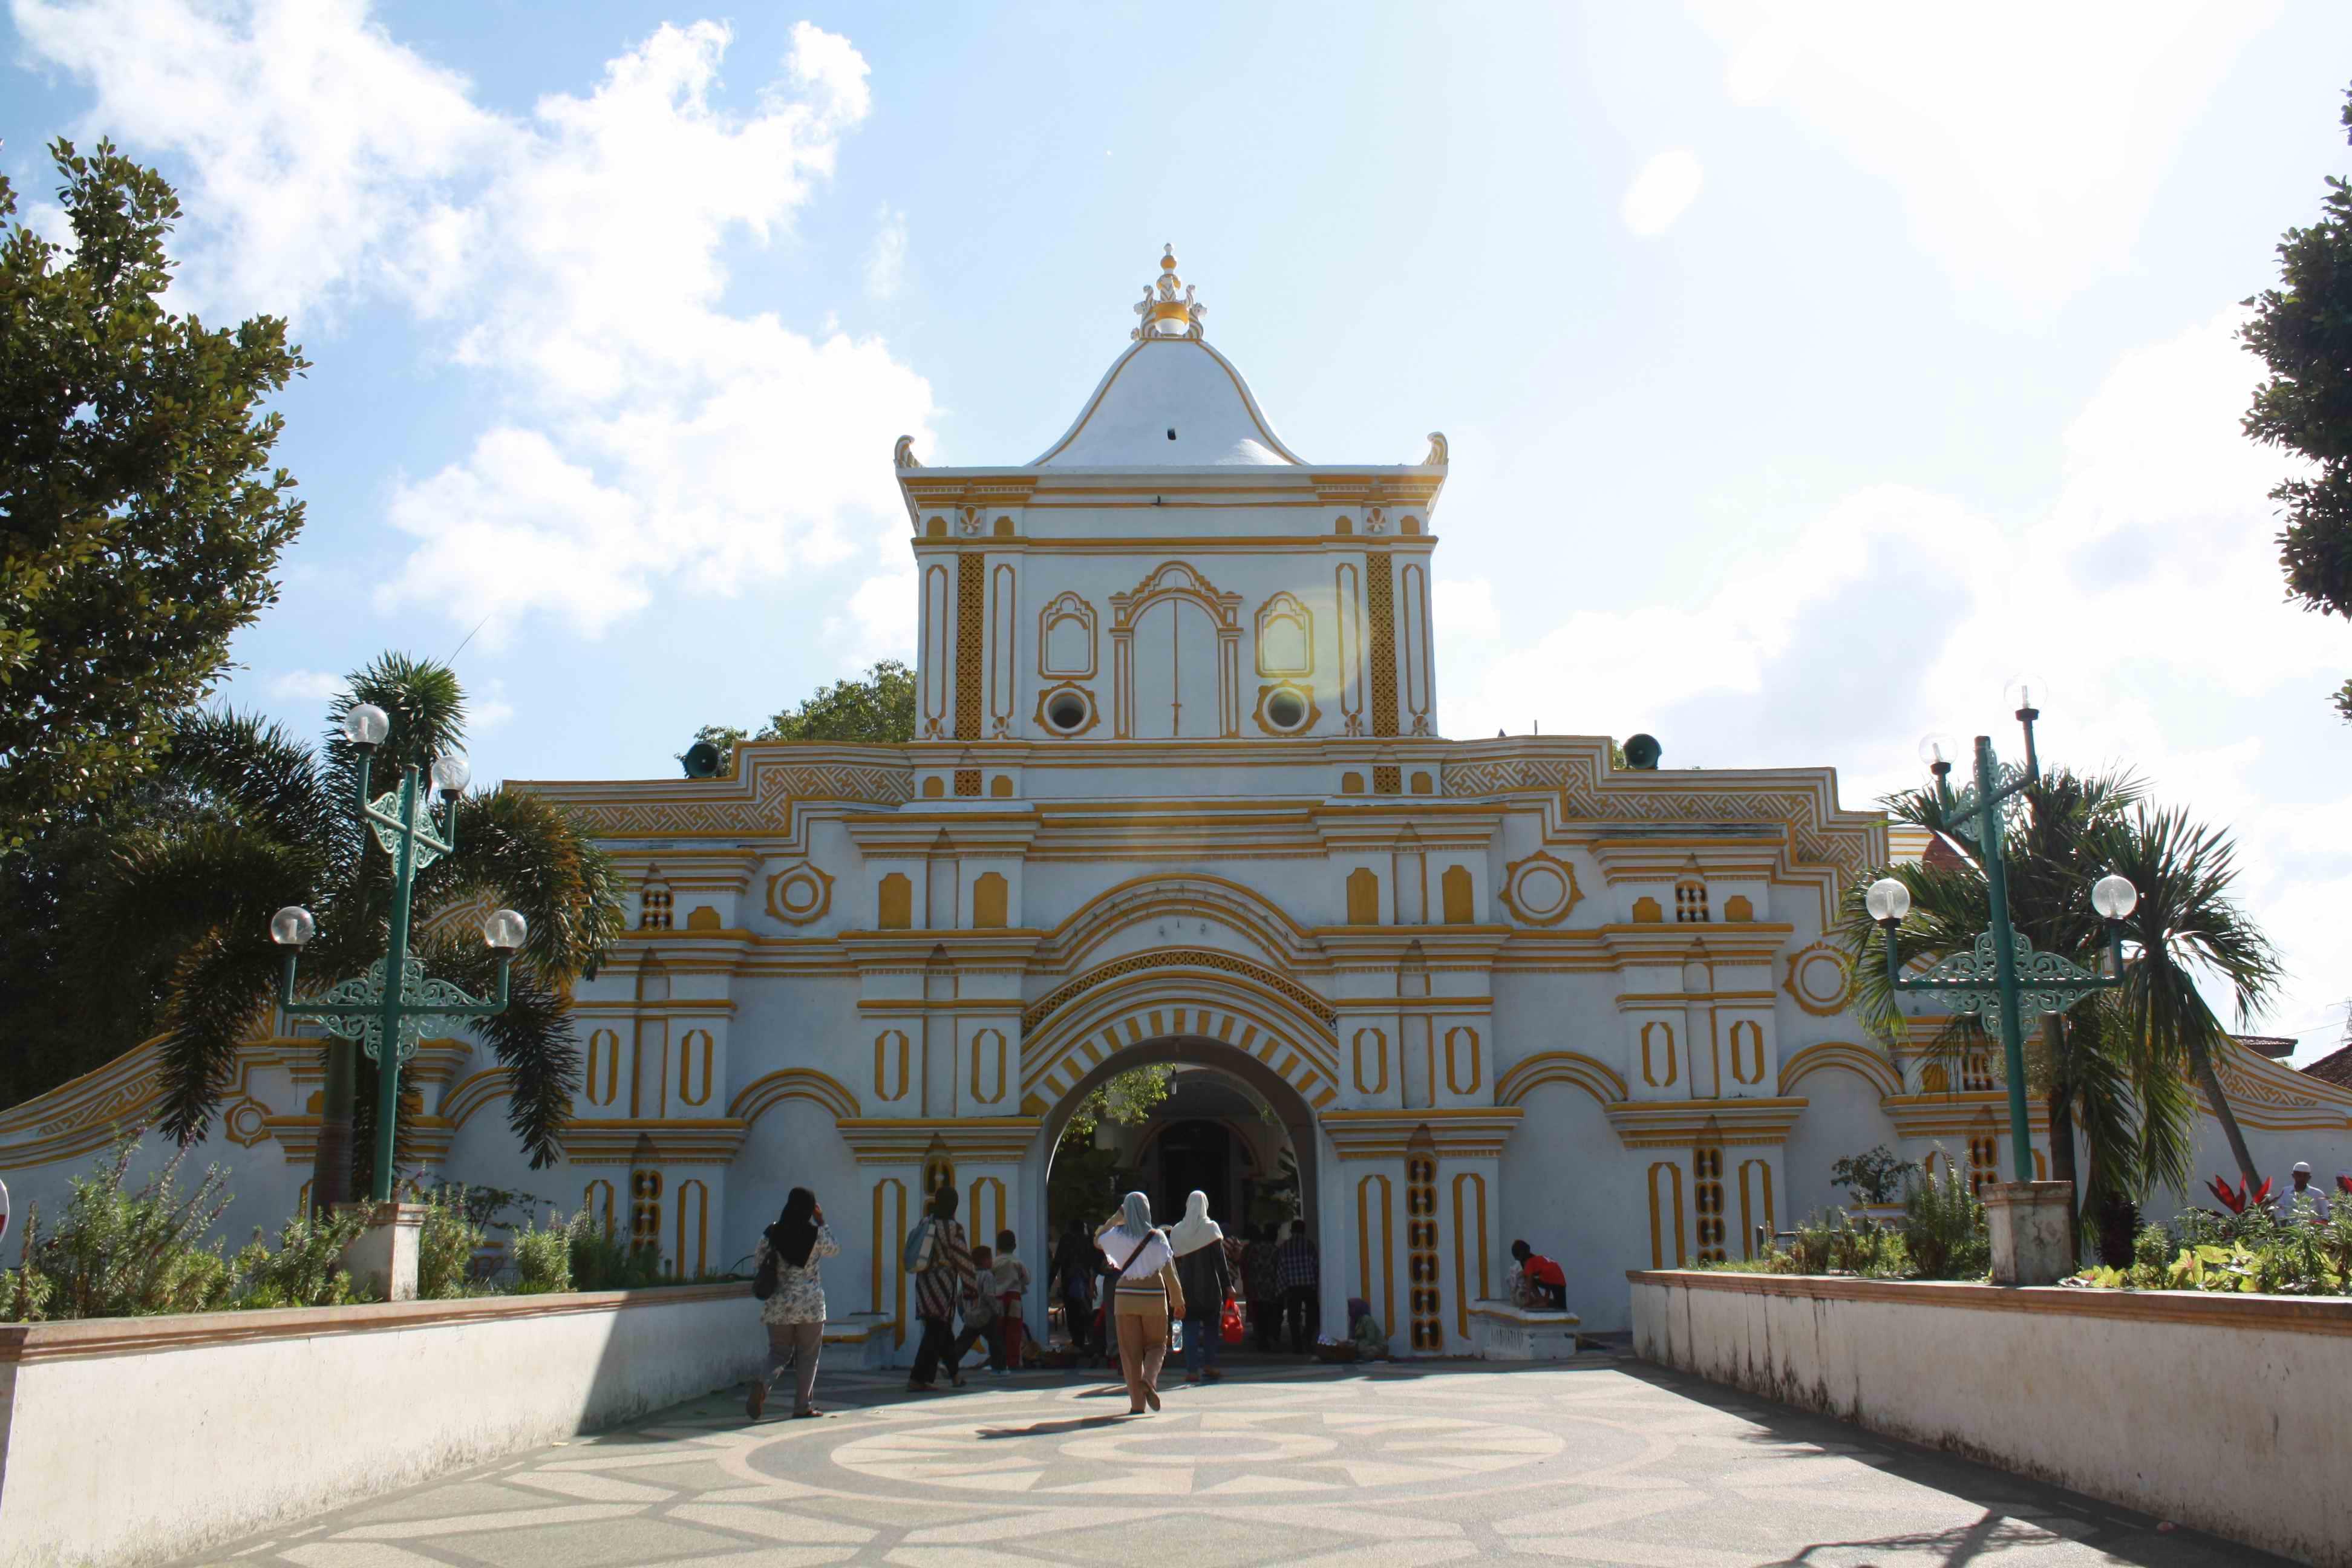 Kabupaten Sumenep Madura Iniilaamoy House Batik 07 Dscn2269 9tampak Depan